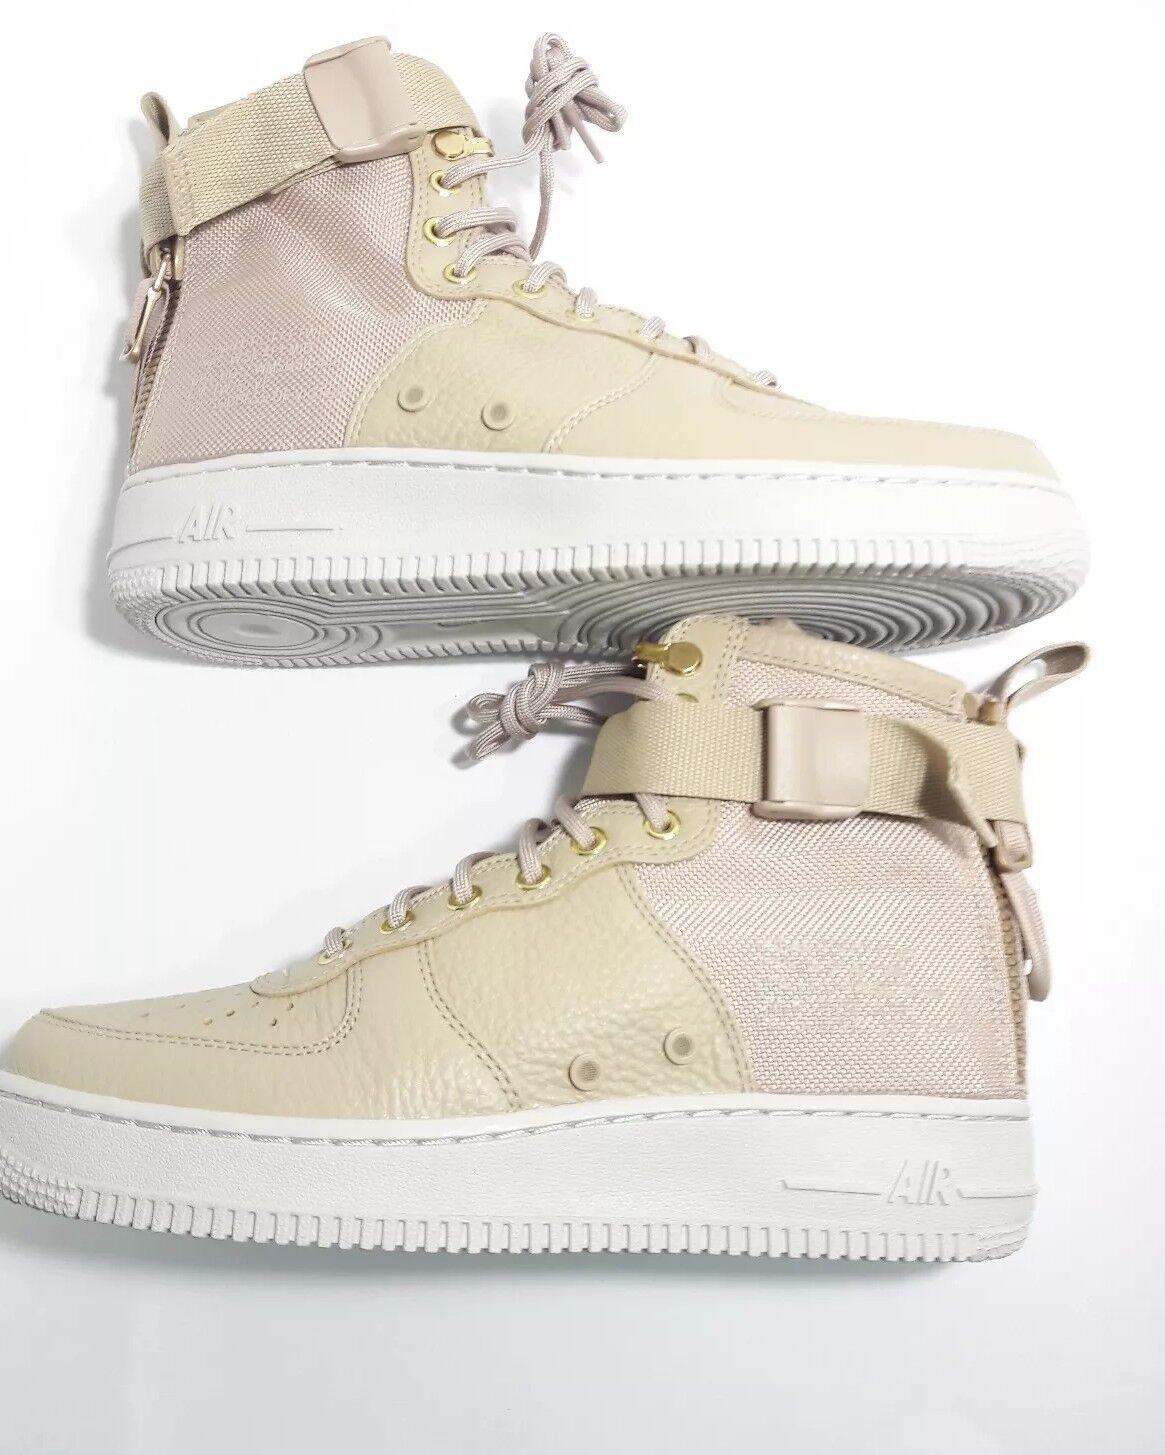 NIKE  Women Men Special Field Air Force 1 Mid Sneakers Beige shoes SF